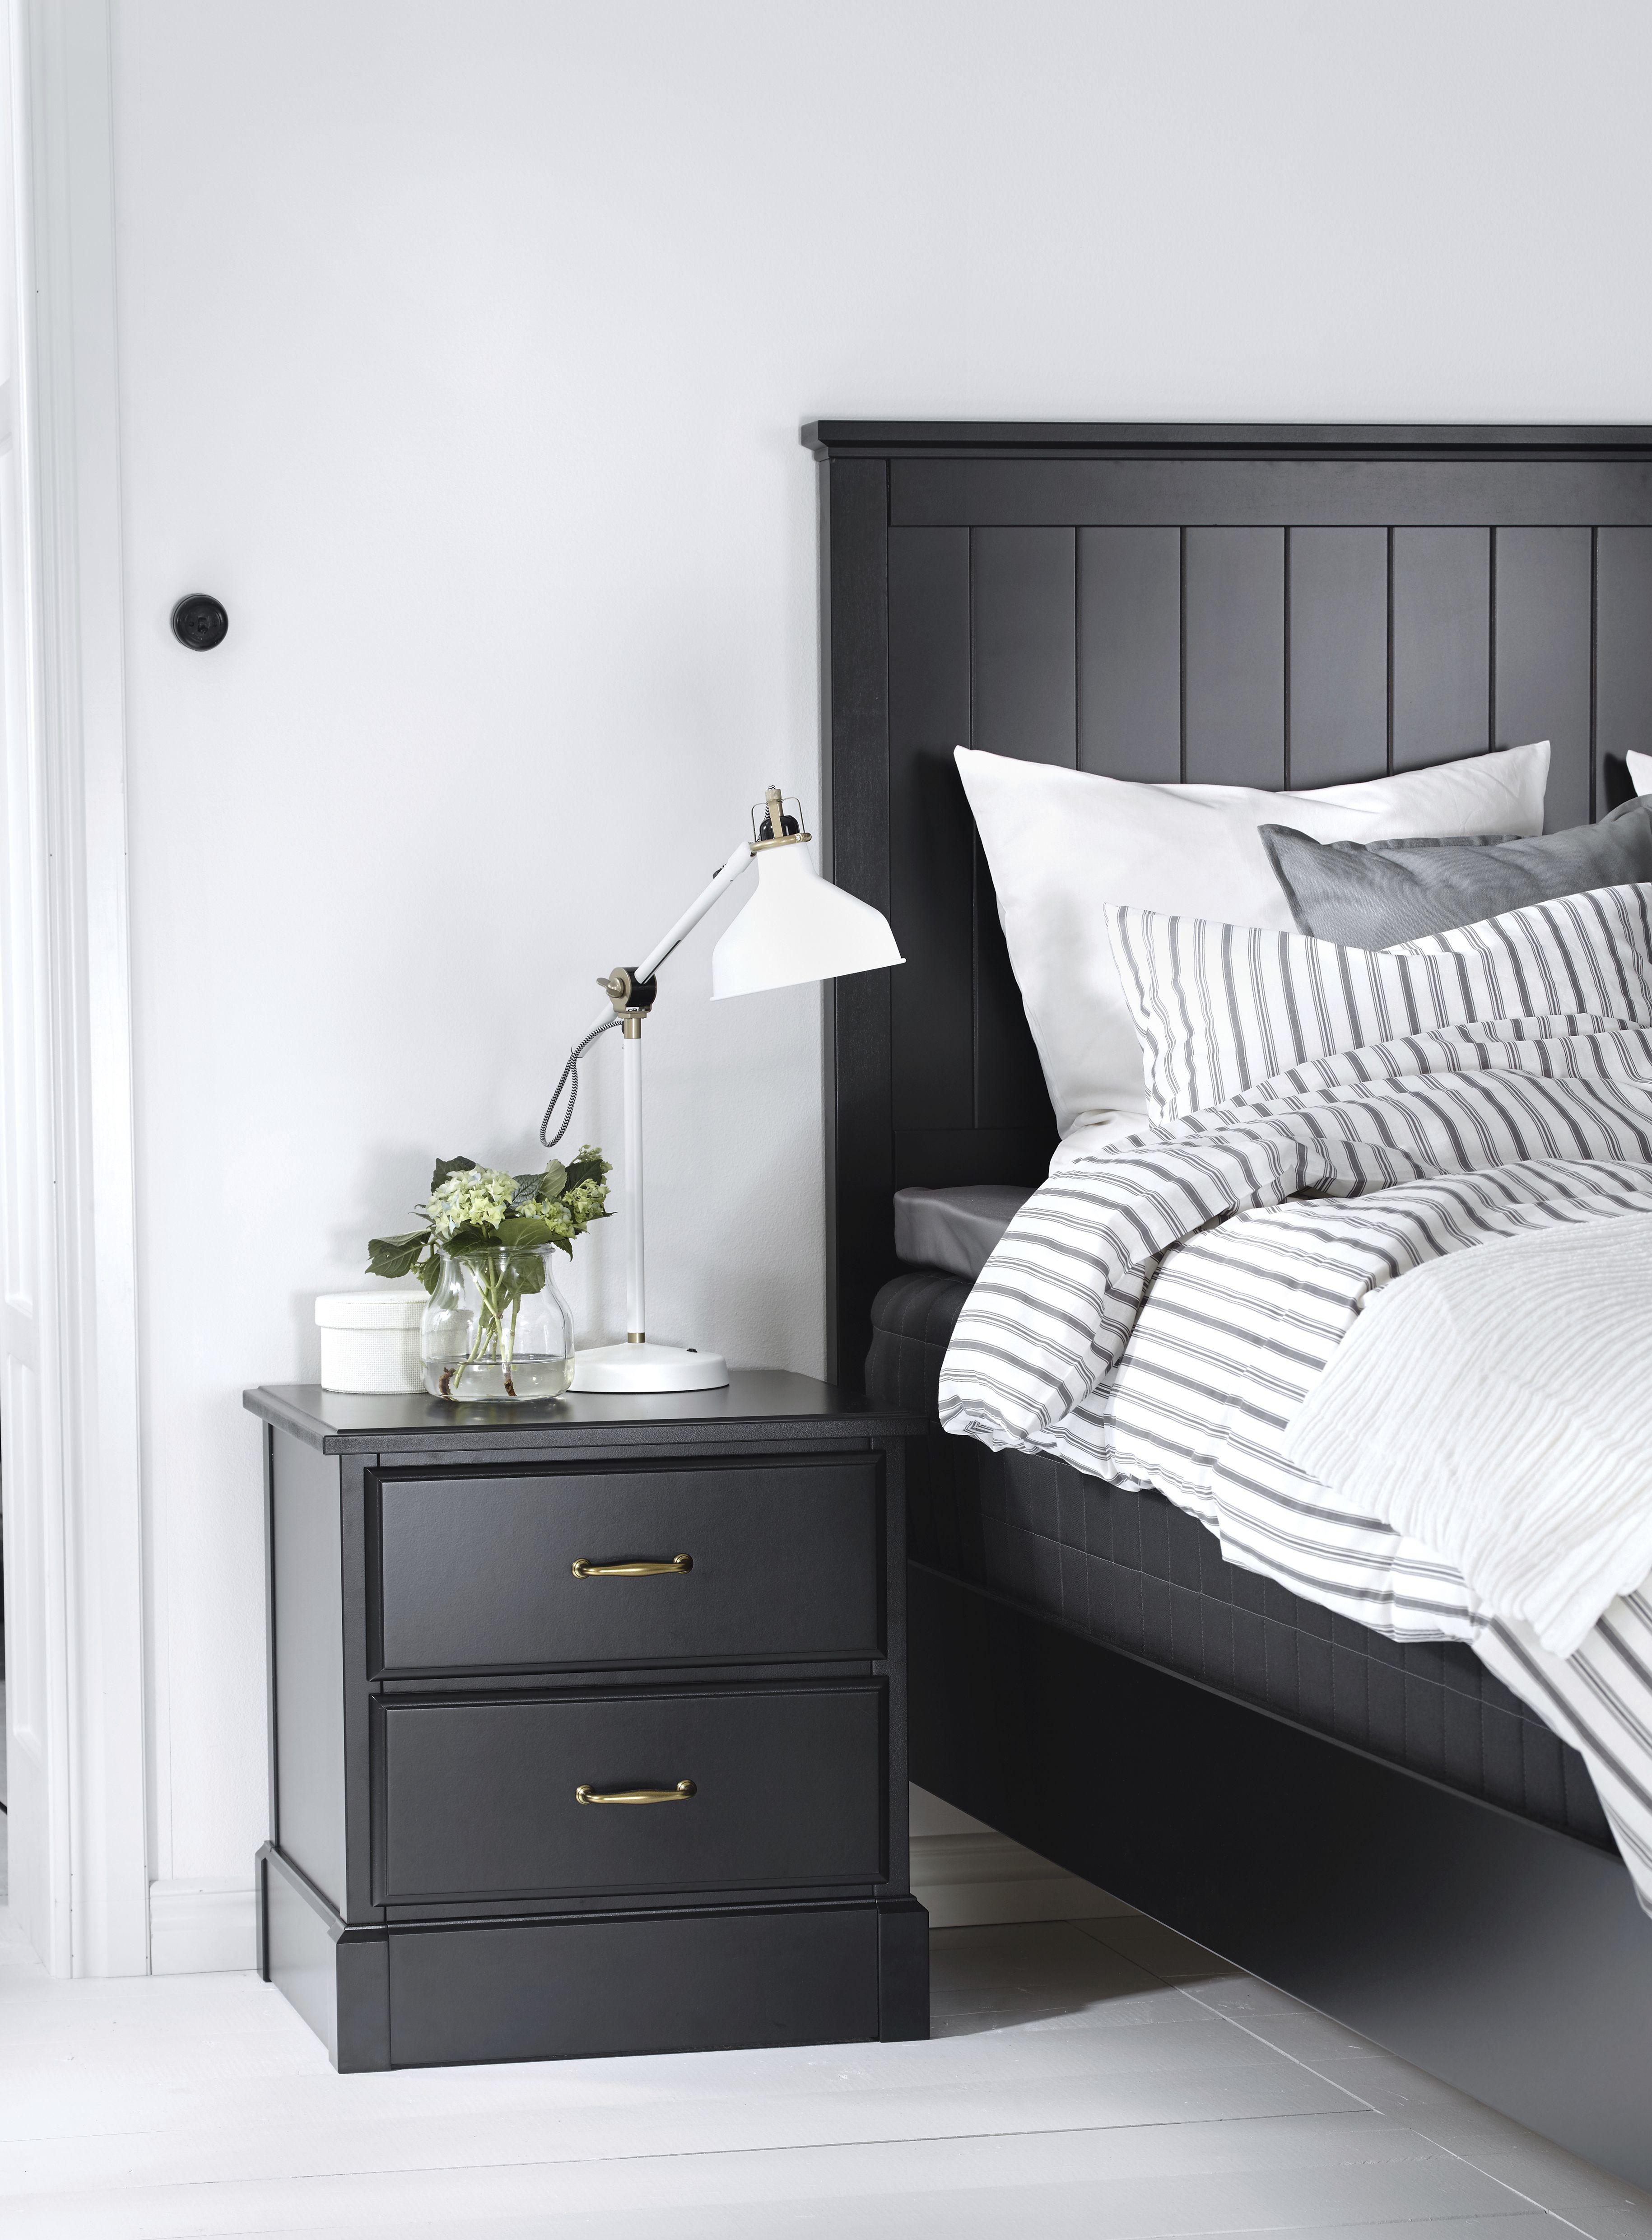 Ikea schlafzimmer serie - Schlafzimmermobel ikea ...